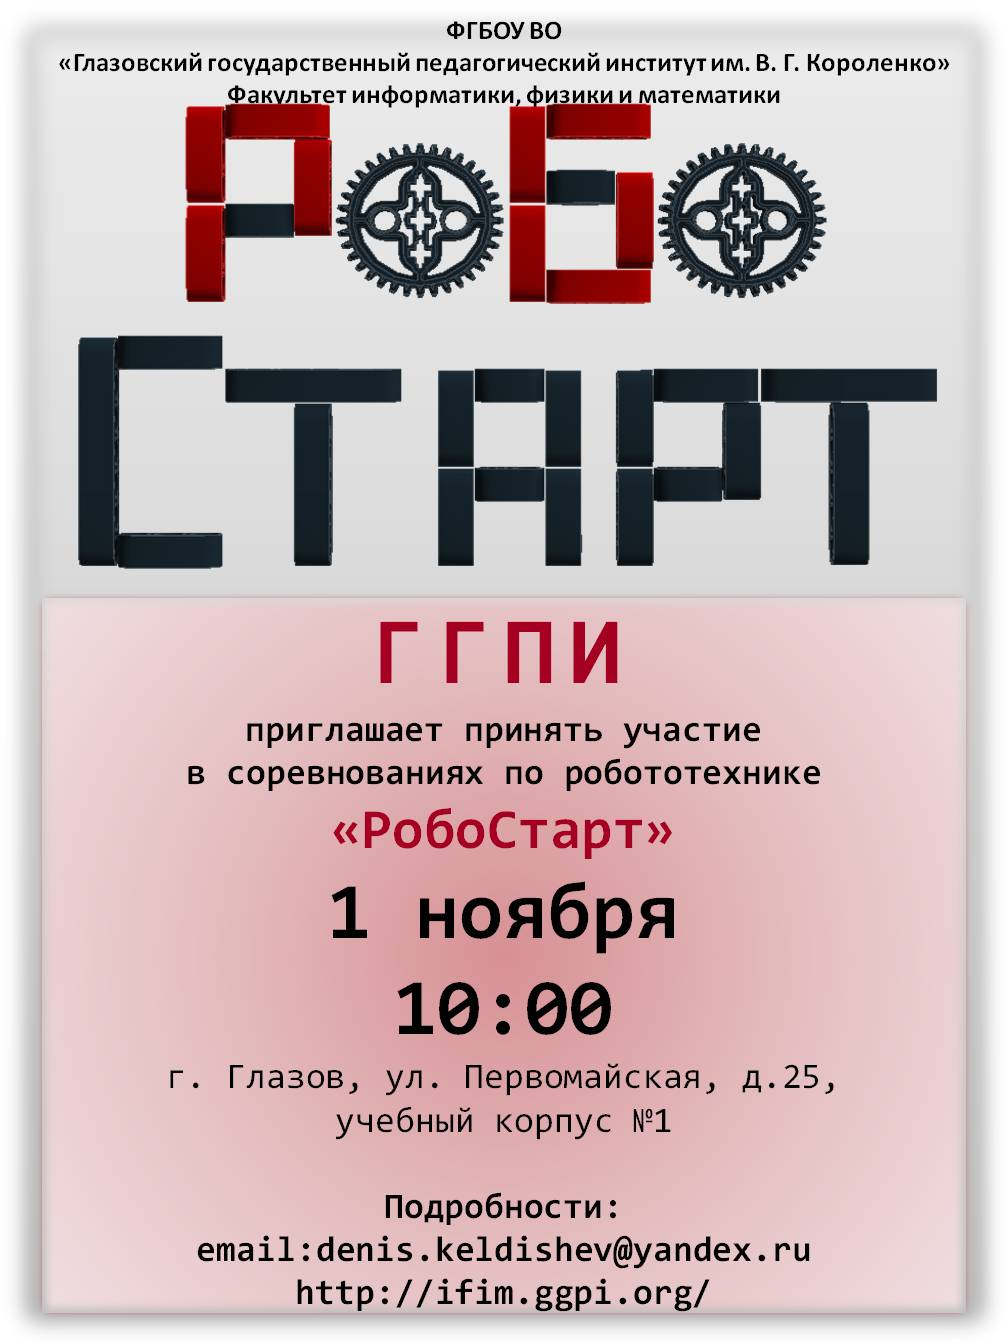 Афиша РобоСтарт 2019